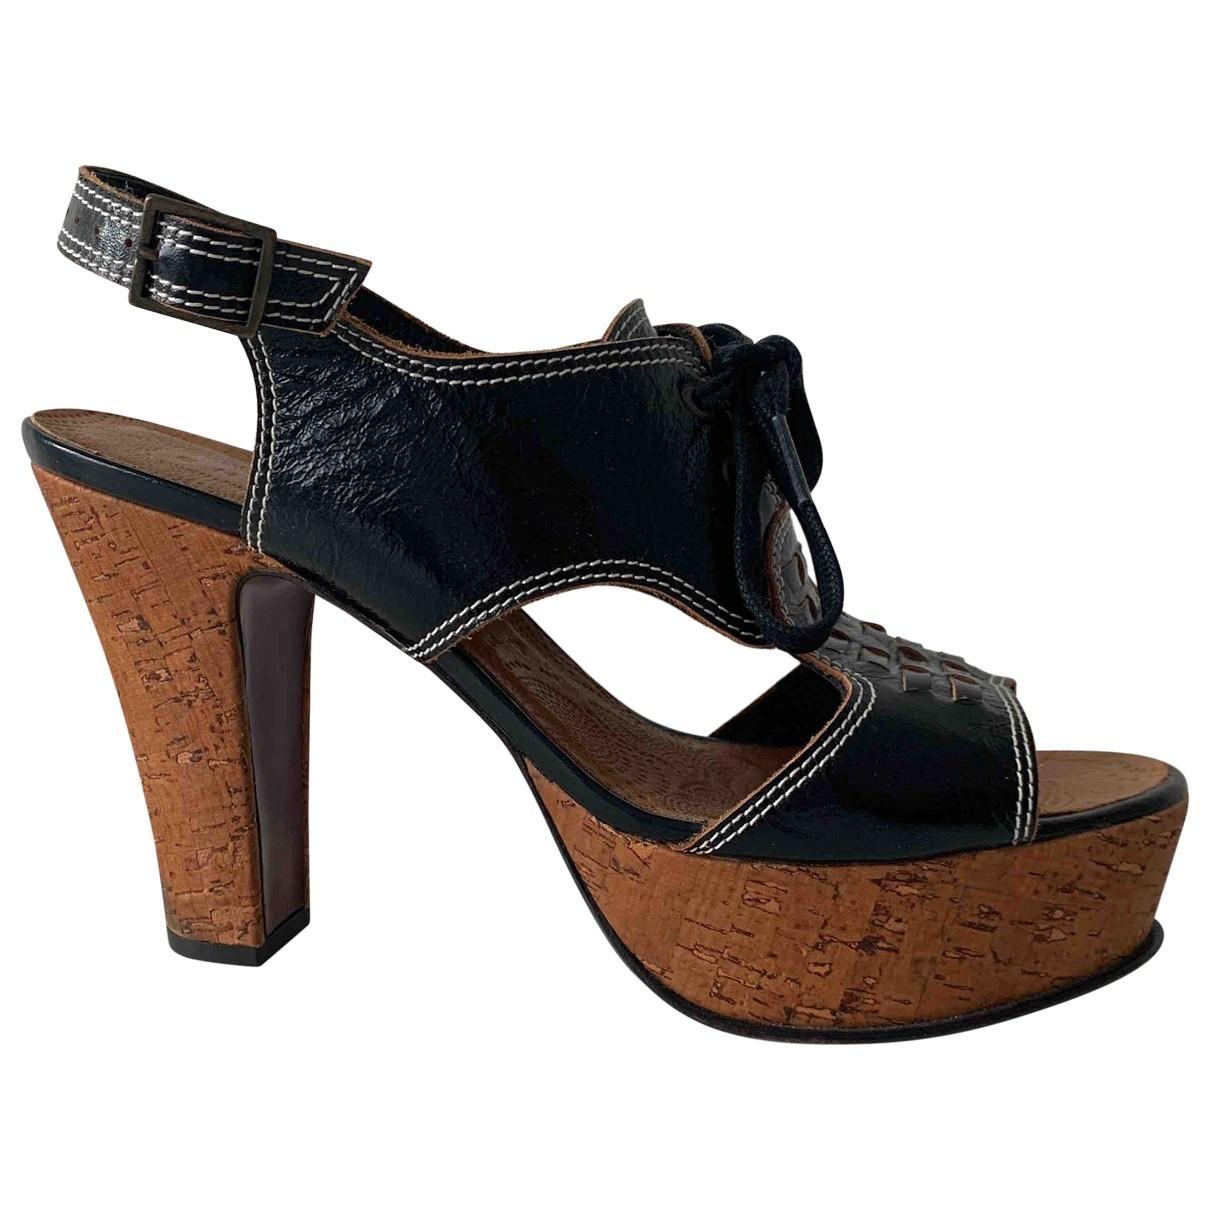 Chie Mihara \N Sandalen in  Schwarz Leder